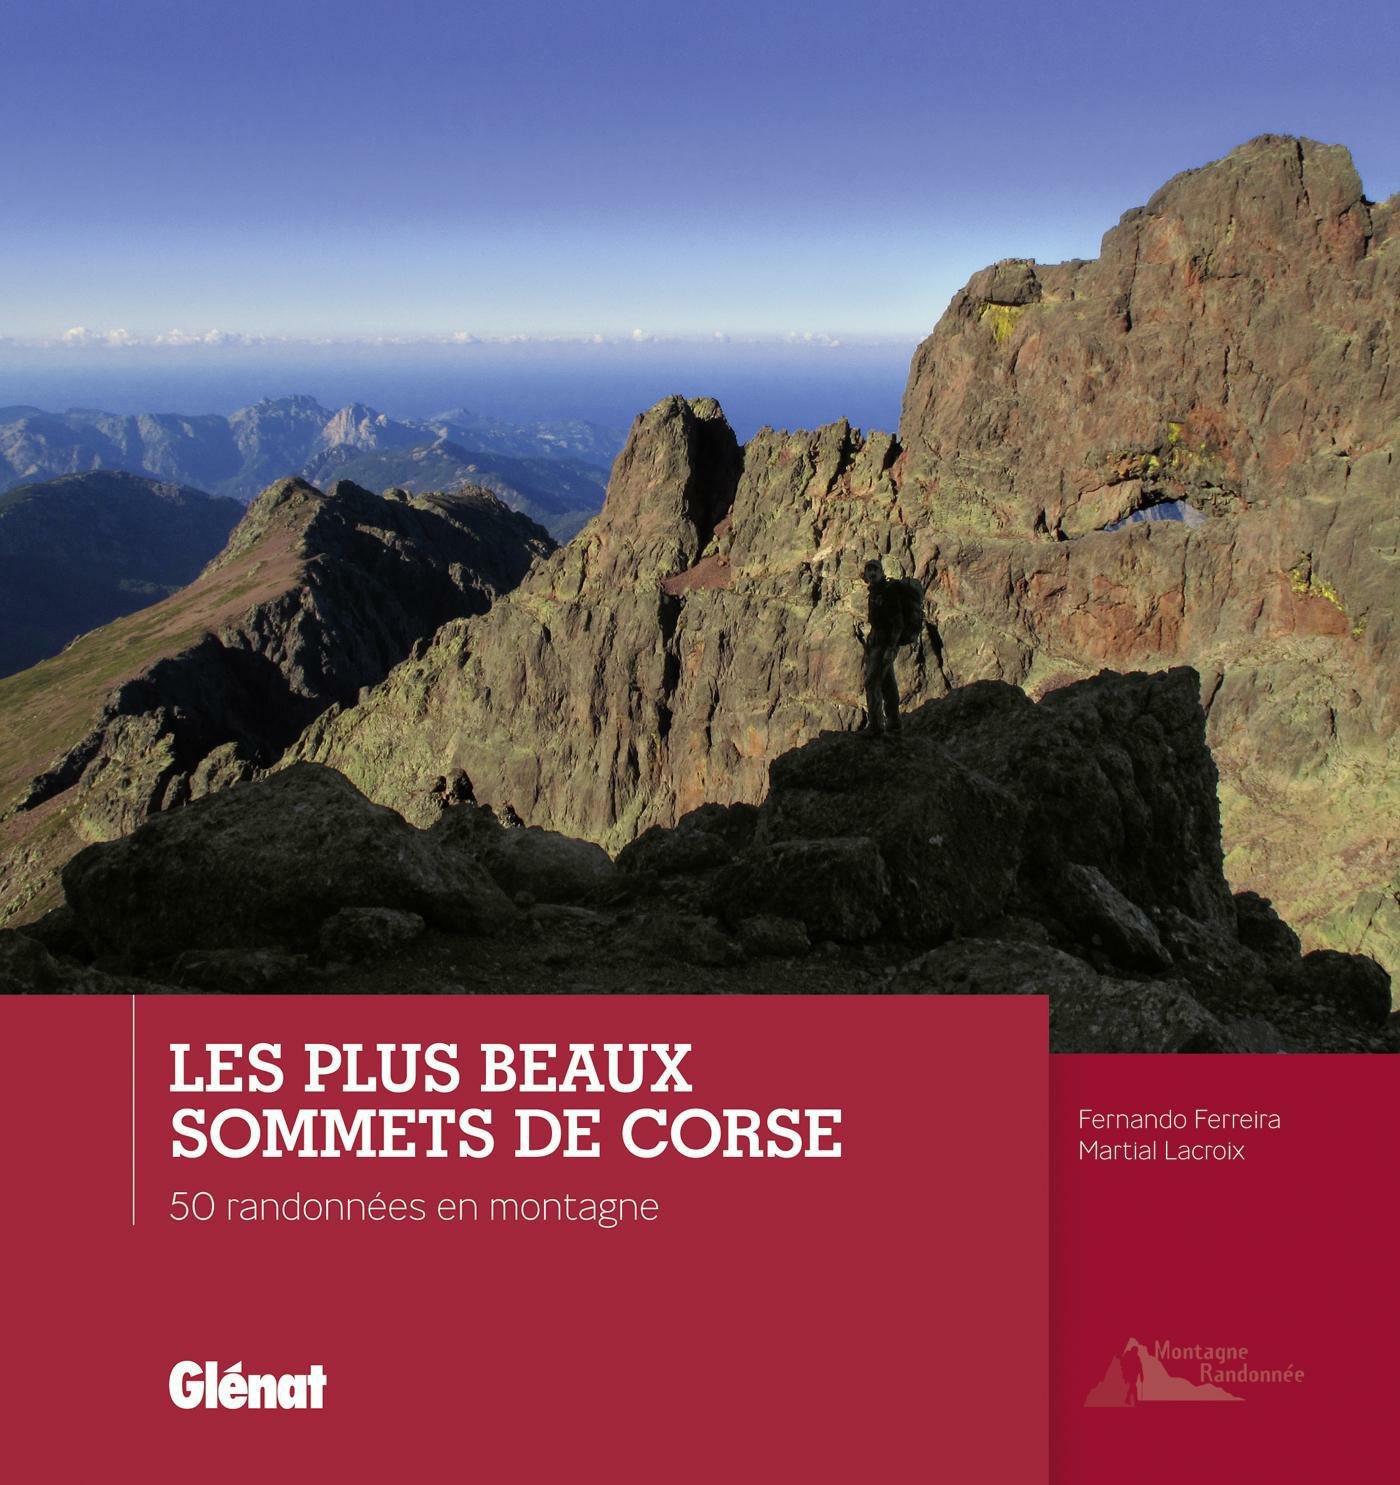 Corse les plus beaux sommets 9782723497367  Glénat   Fotoboeken, Wandelgidsen Corsica